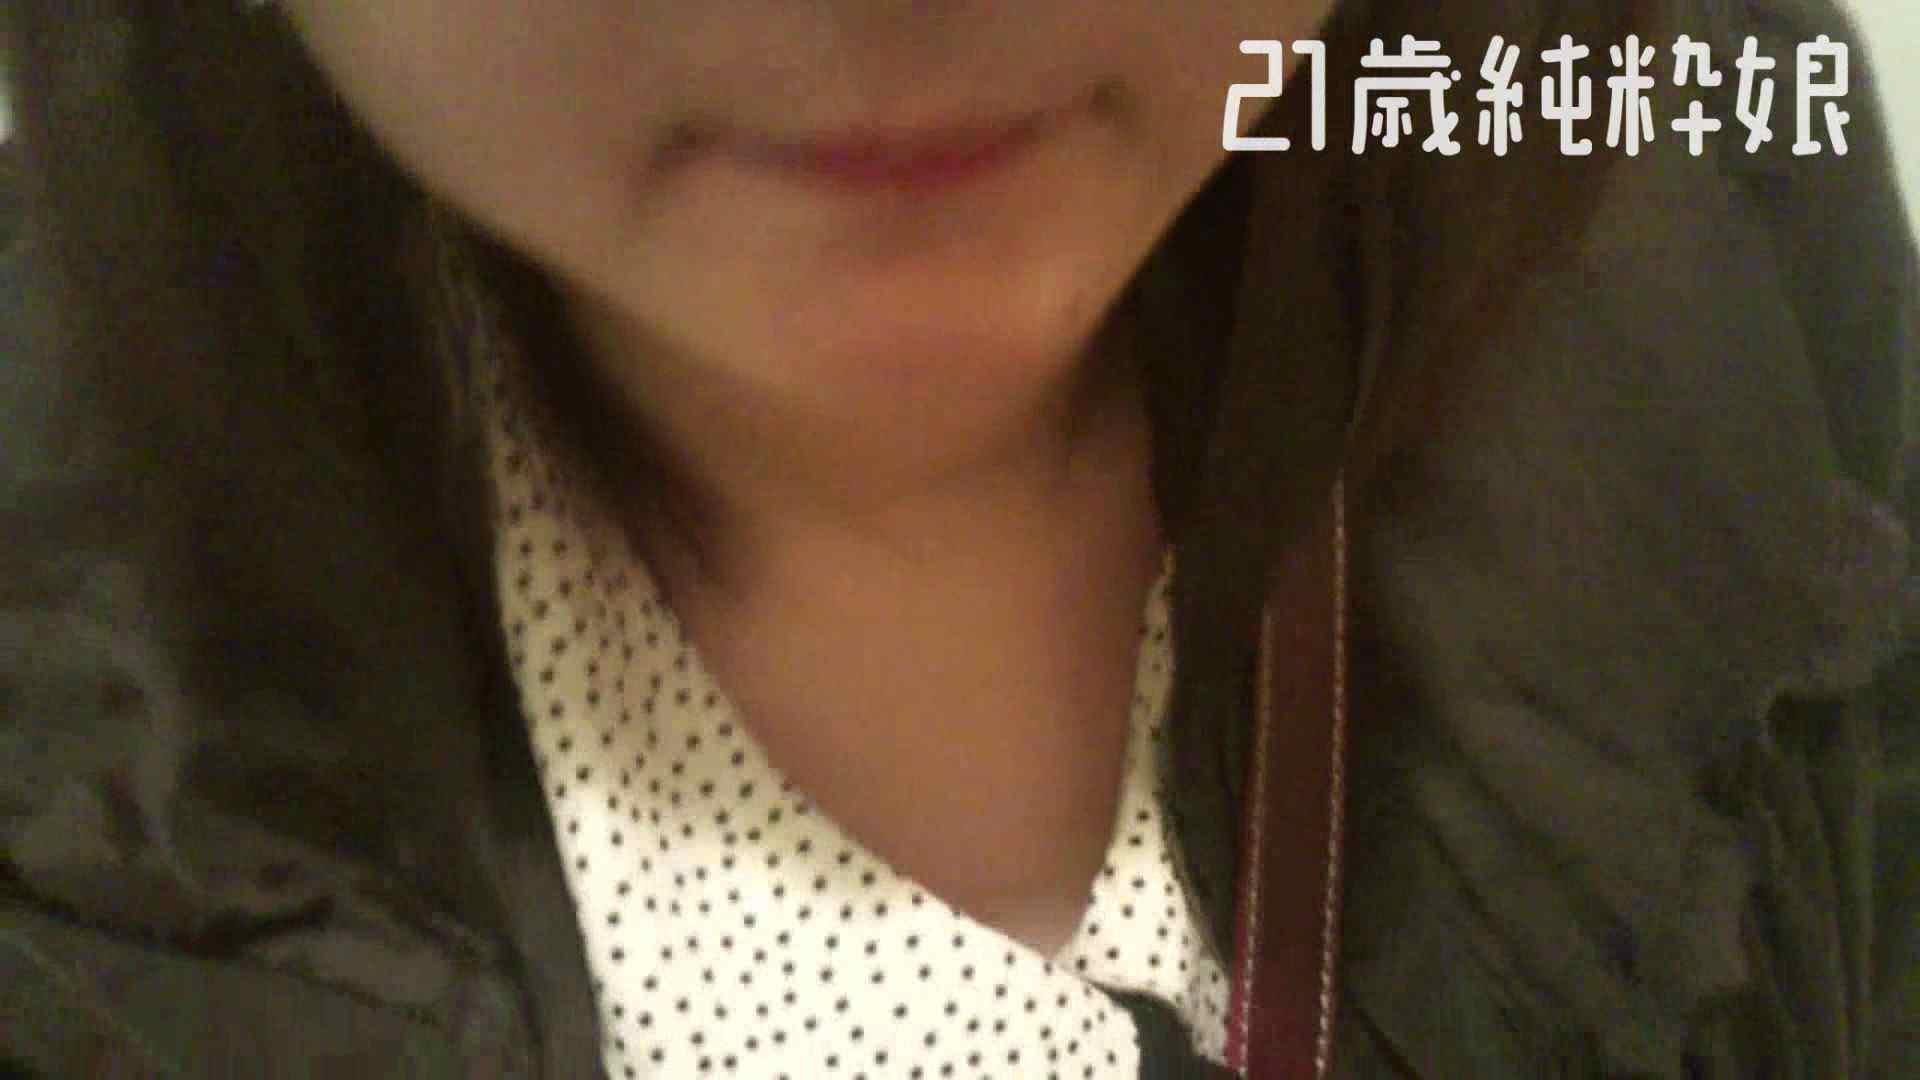 Gカップ21歳純粋嬢第2弾Vol.5 OLヌード天国 | 学校  110PIX 87